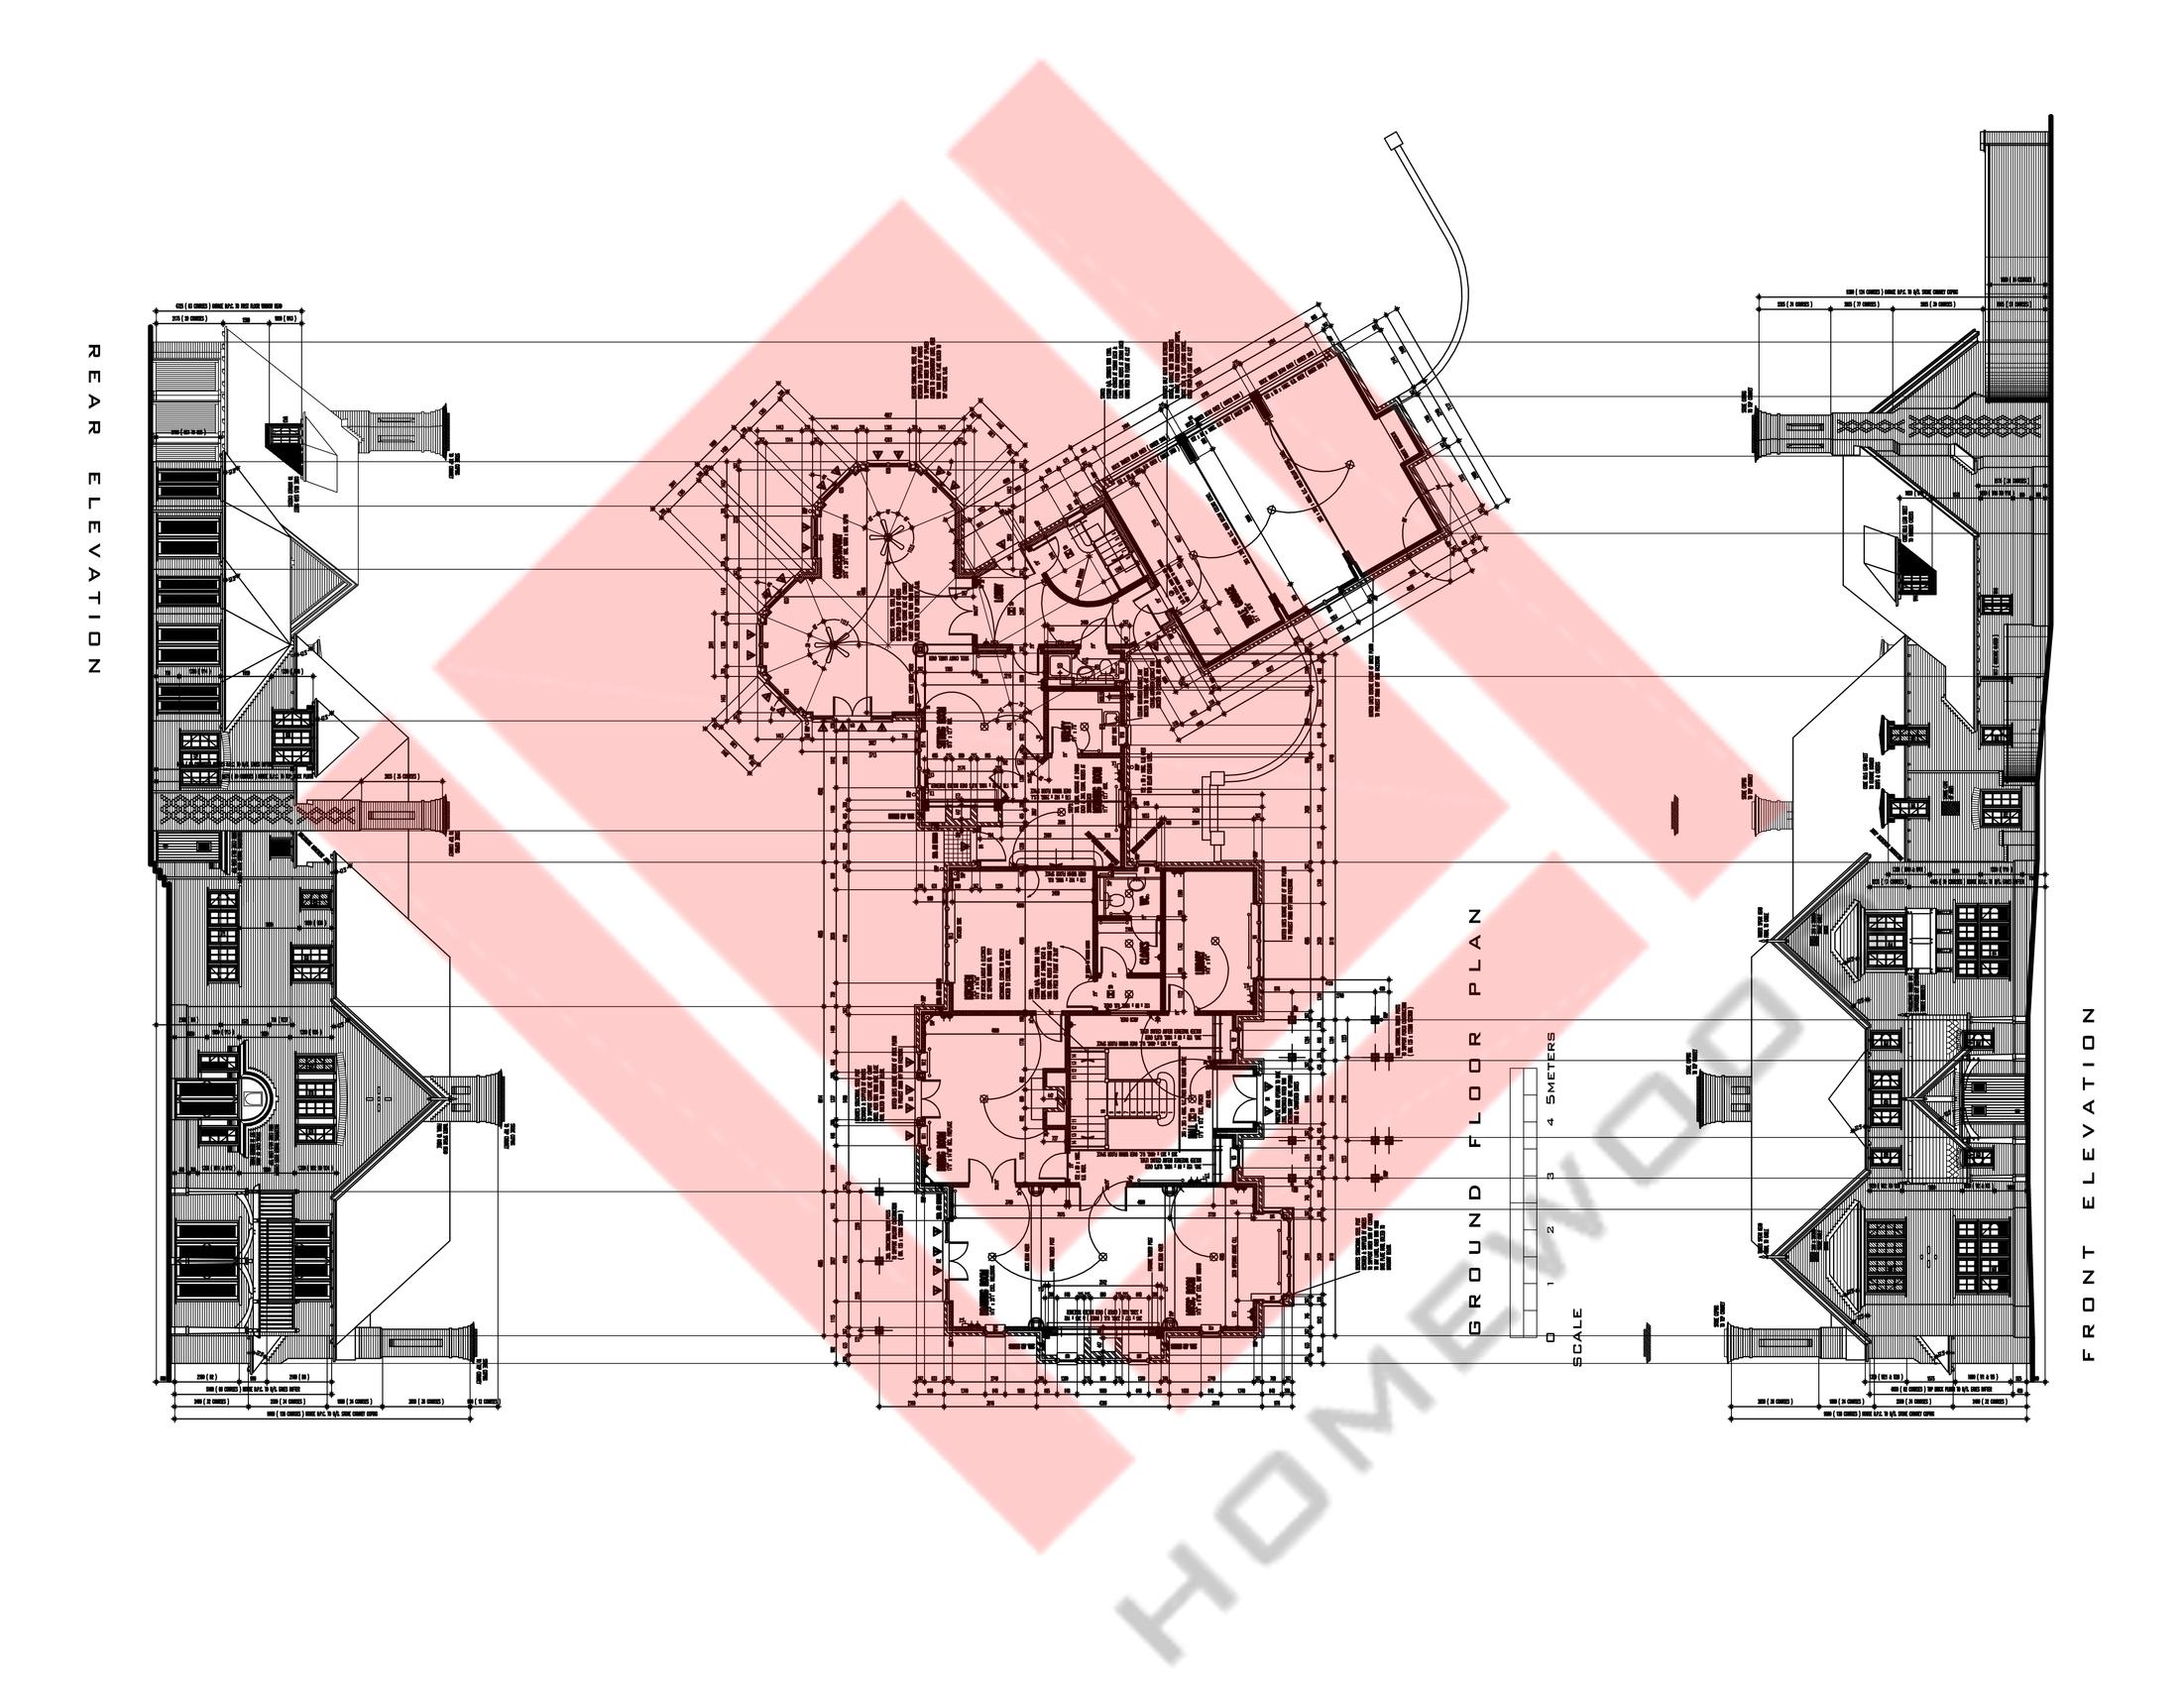 Vale Royal Plot 4 GF & Elevation.Image.Marked_1.png